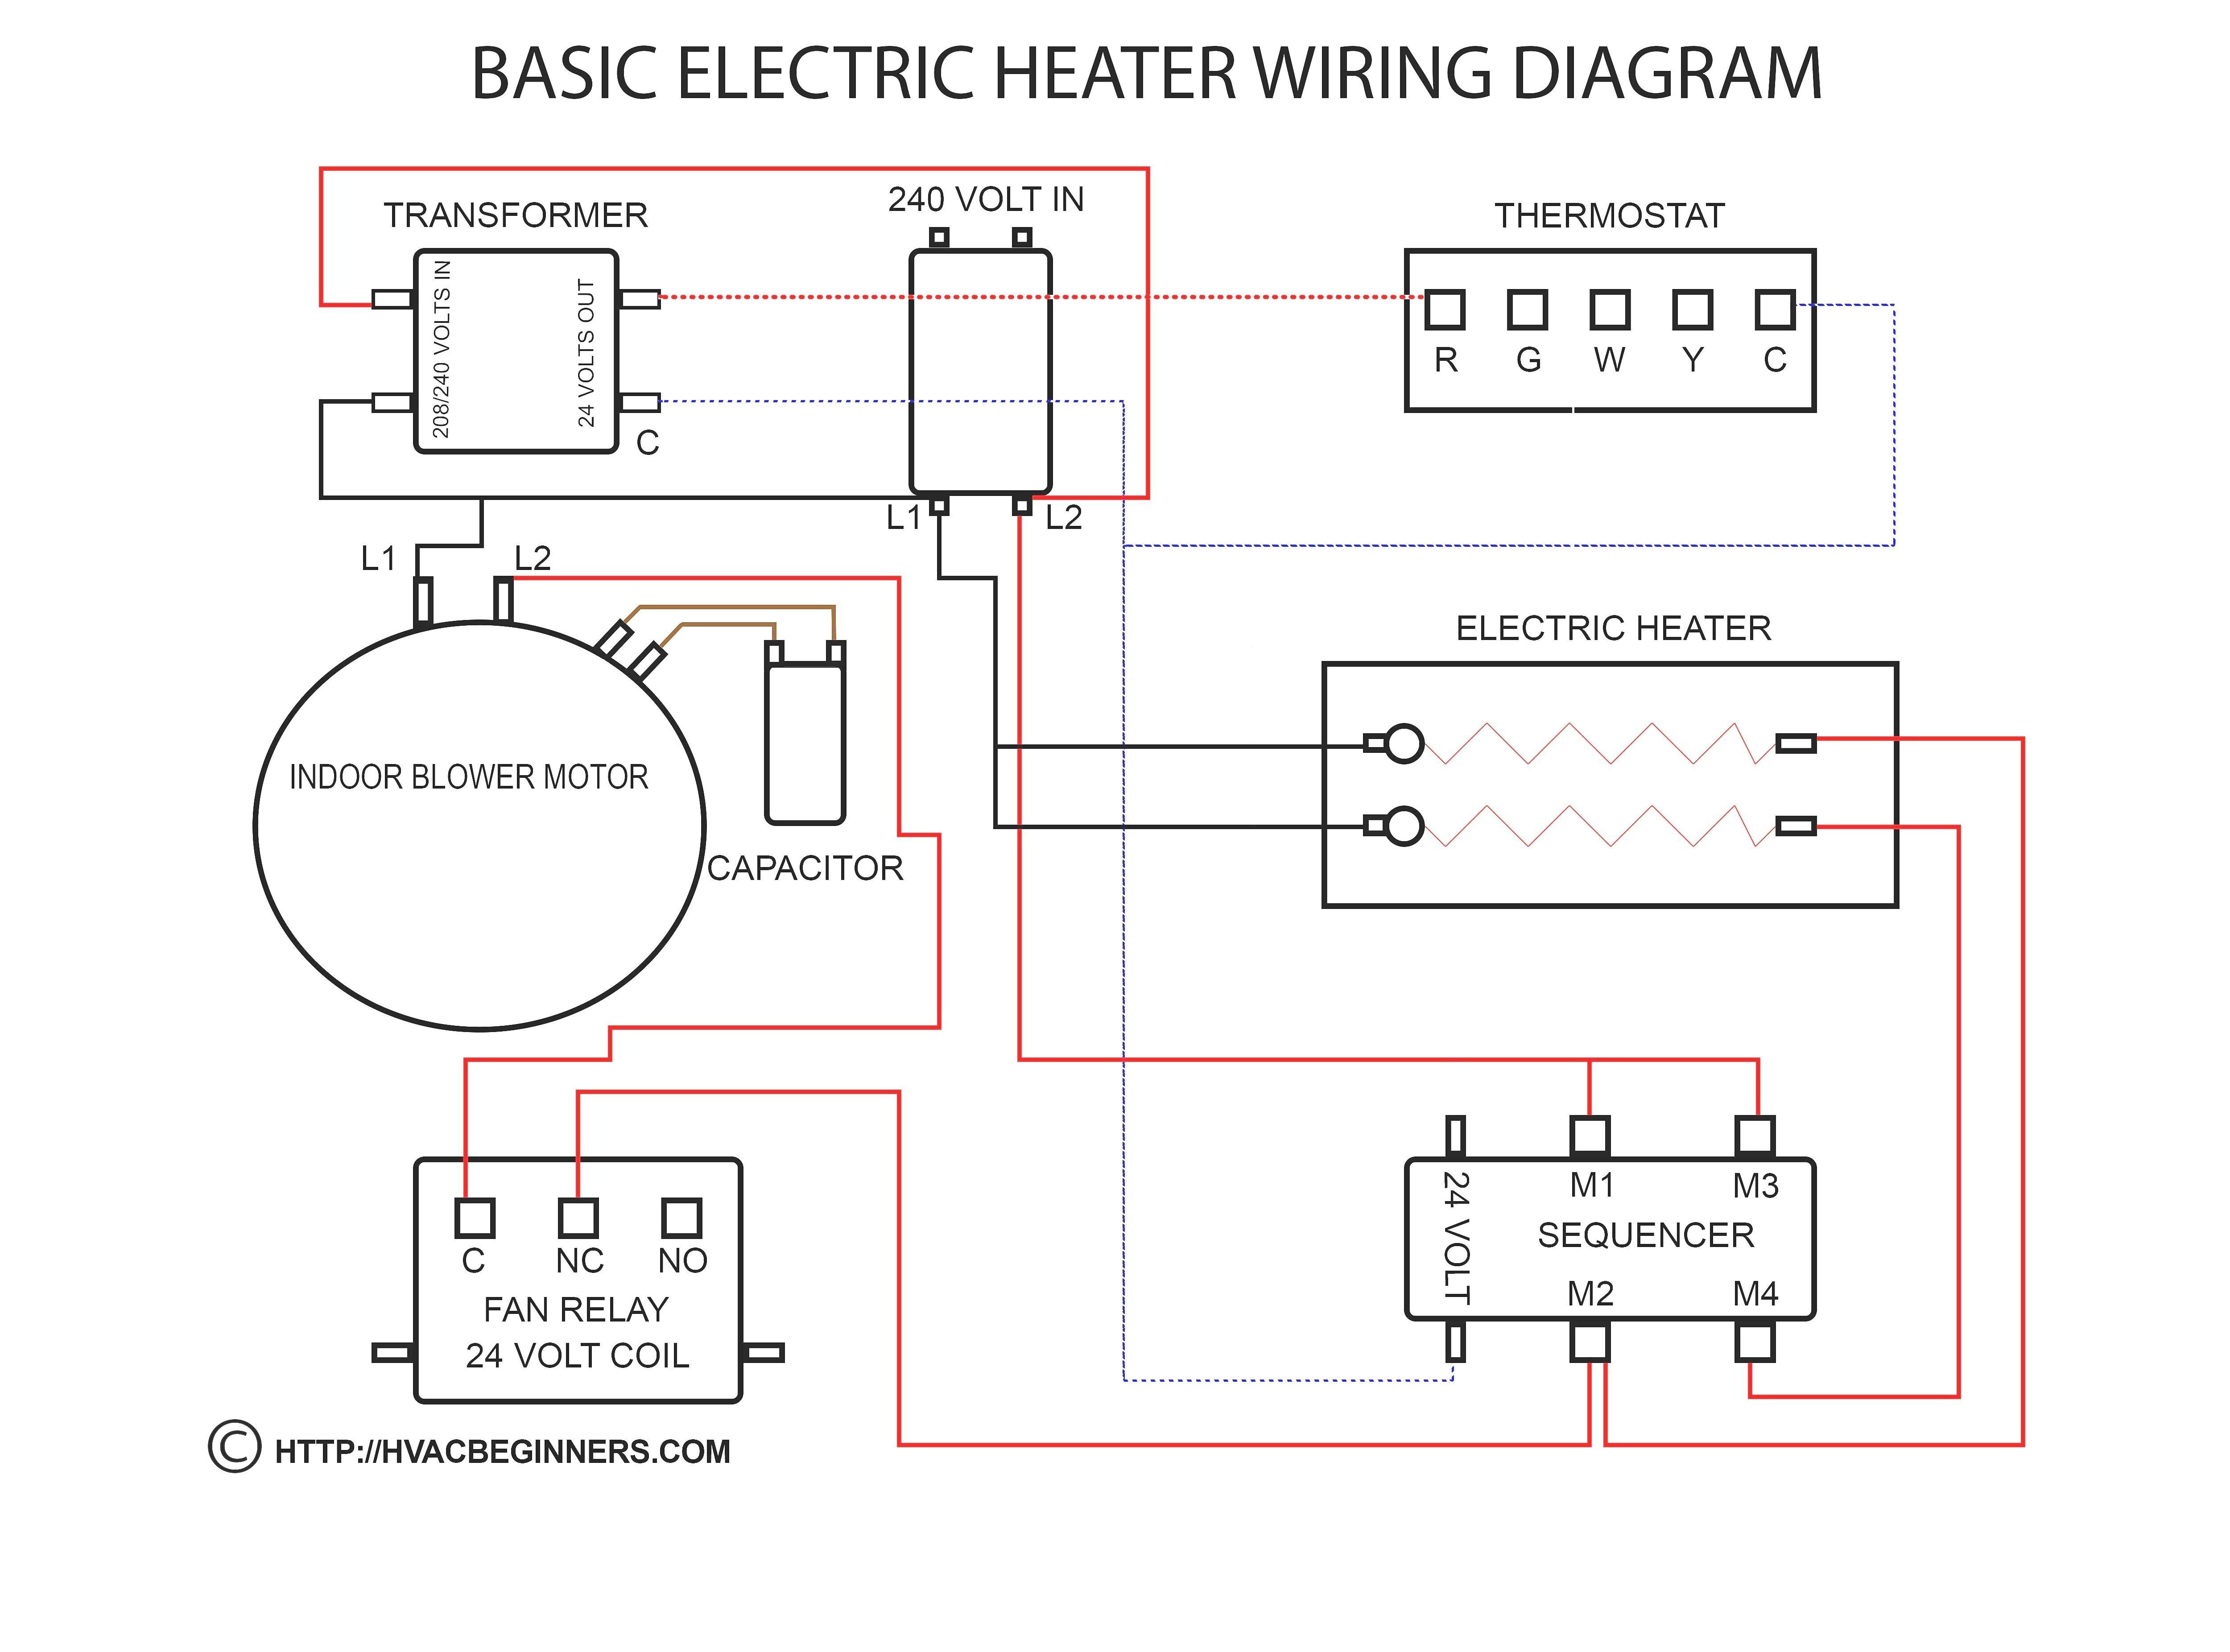 220 Volt Single Phase Wiring Diagram Wiring Diagram Ac Sharp - 240 Volt Single Phase Wiring Diagram